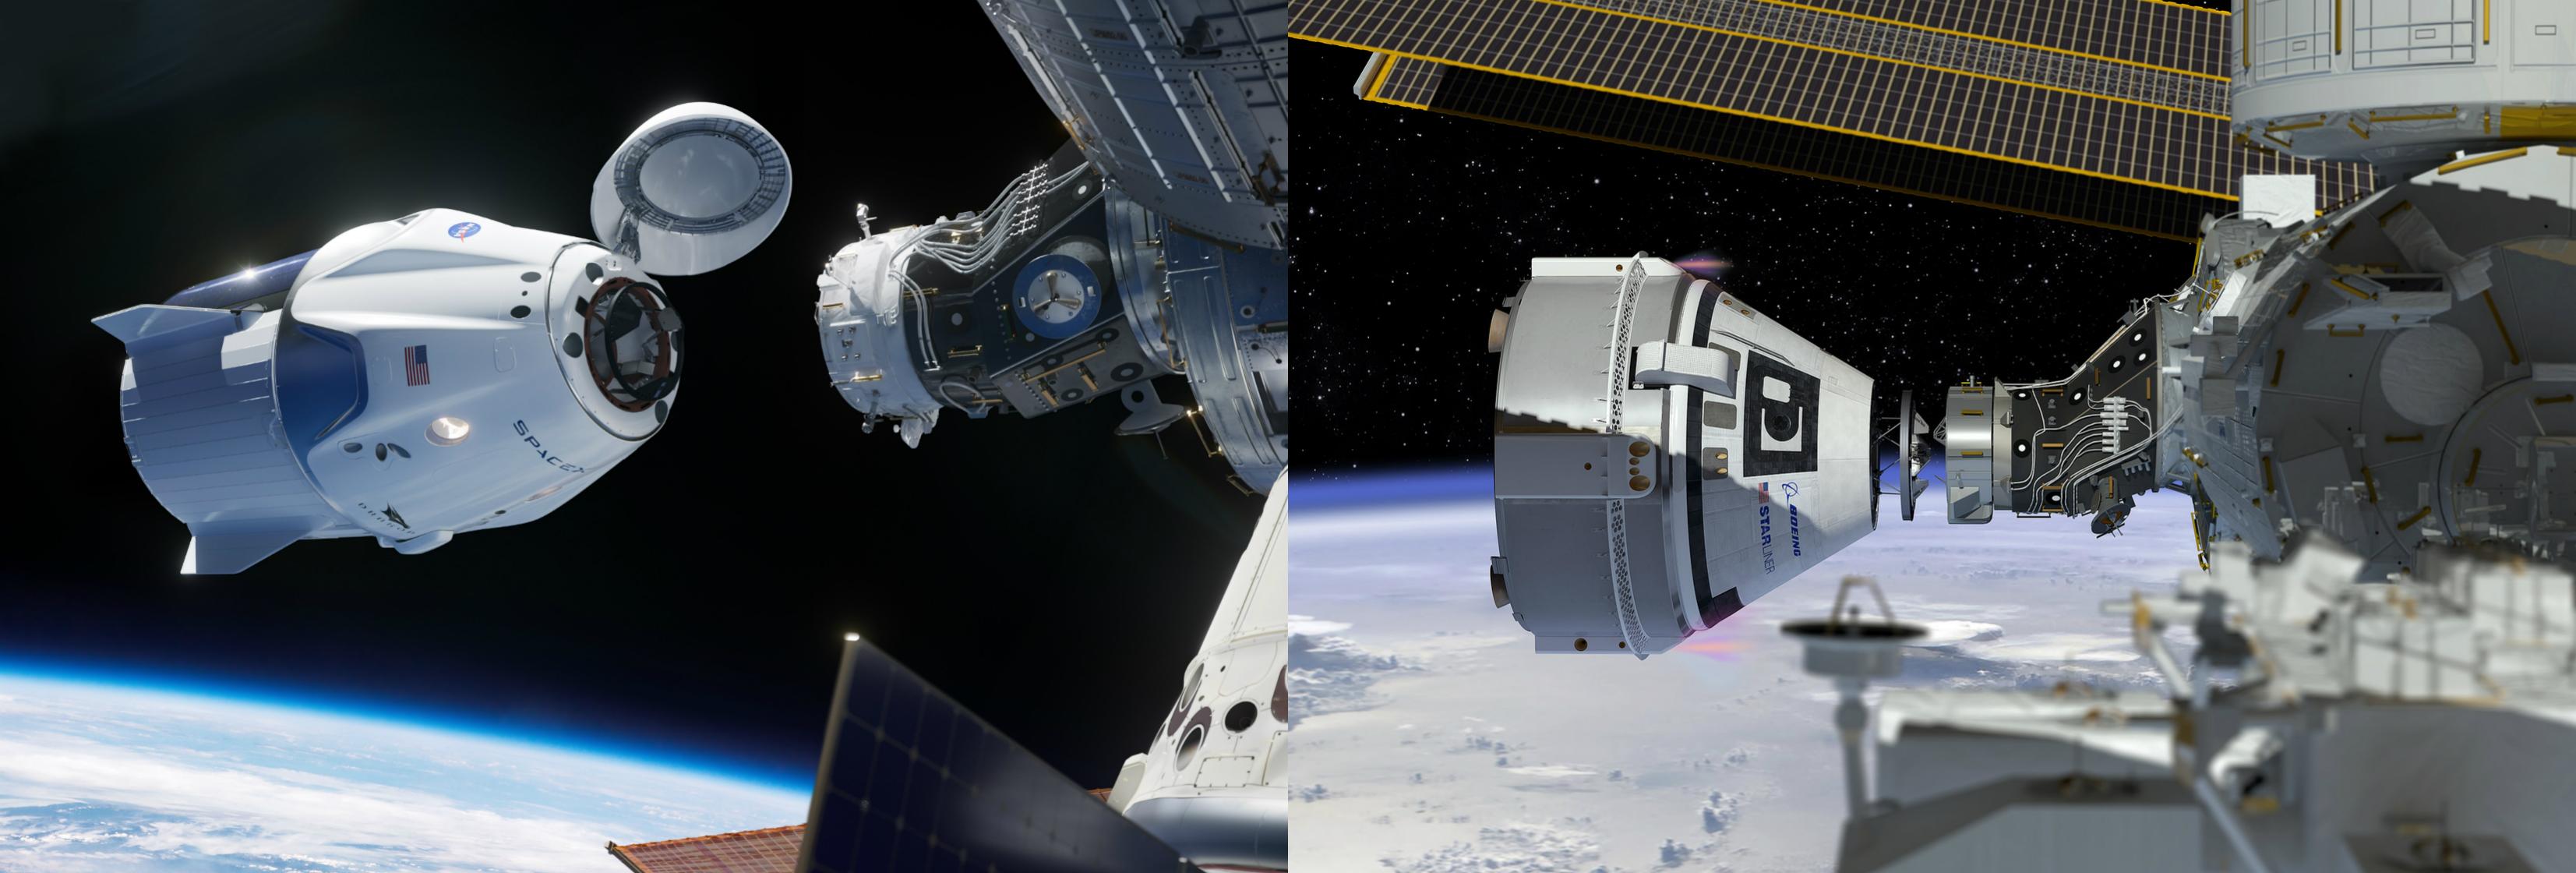 Vesmírné lodě Crew Dragon a Starliner CST-100